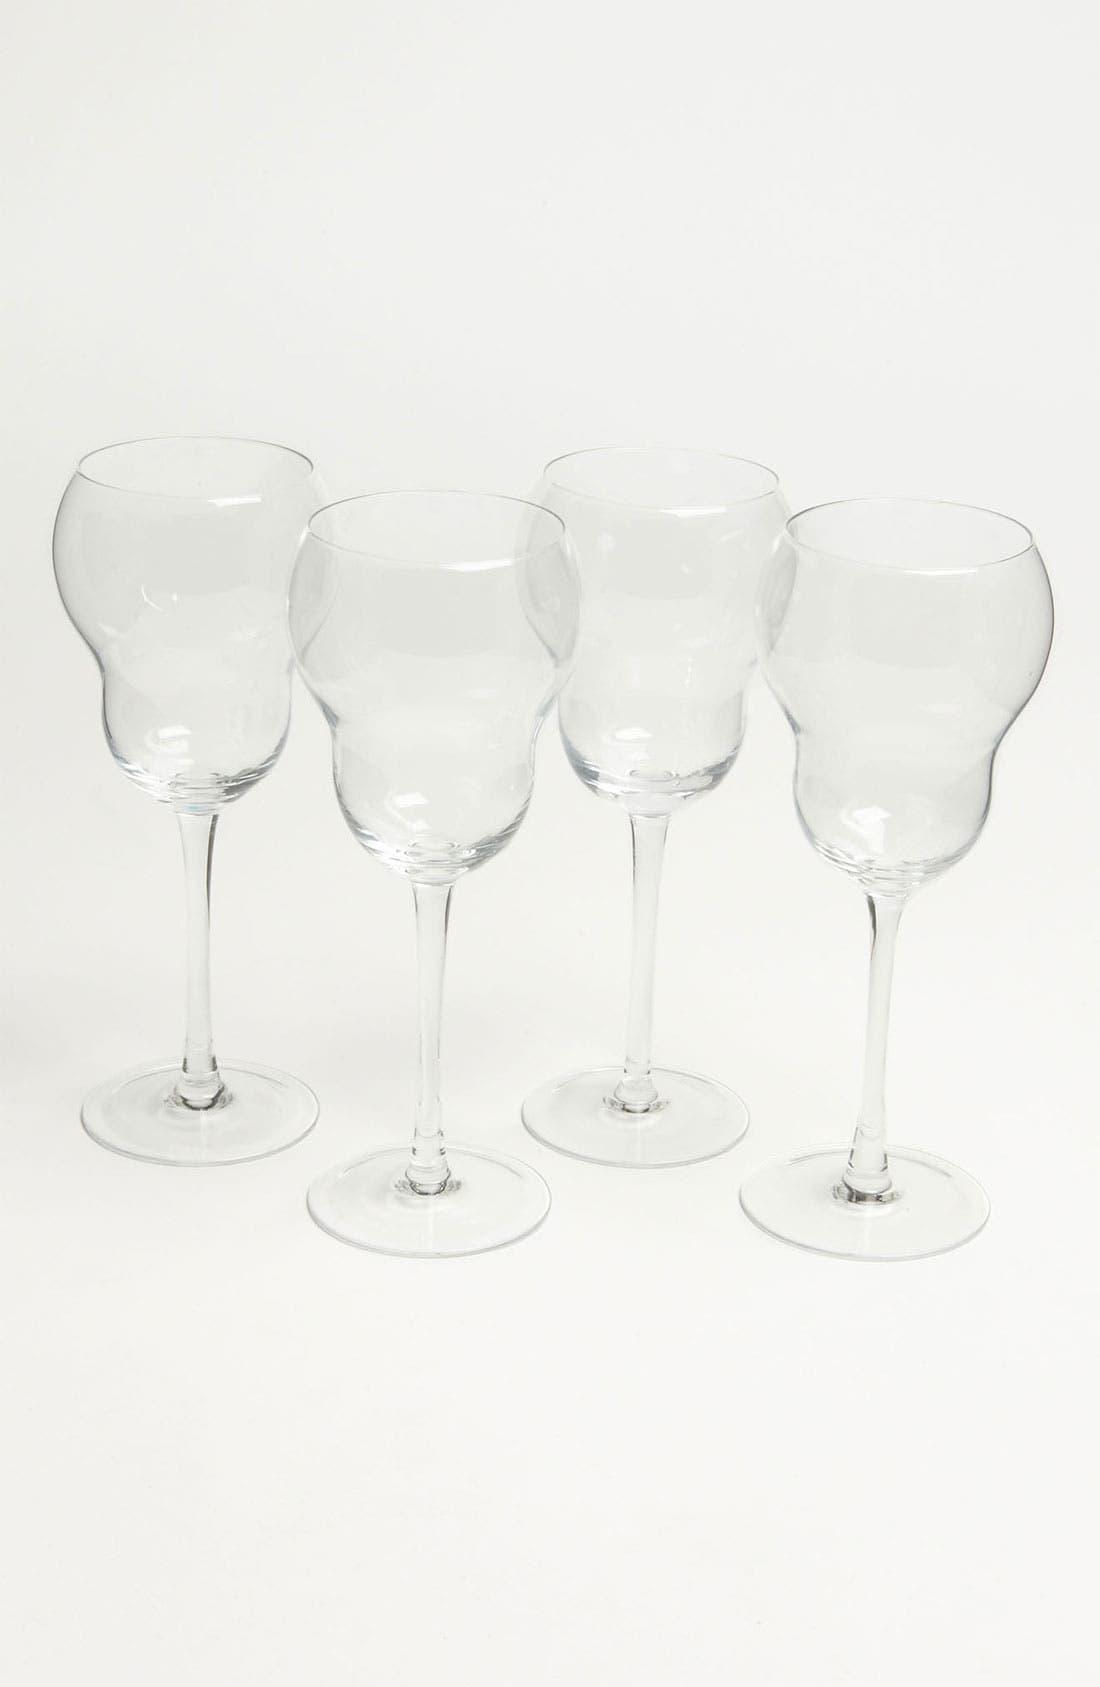 Main Image - 'Bubble' White Wine Glasses (Set of 4)